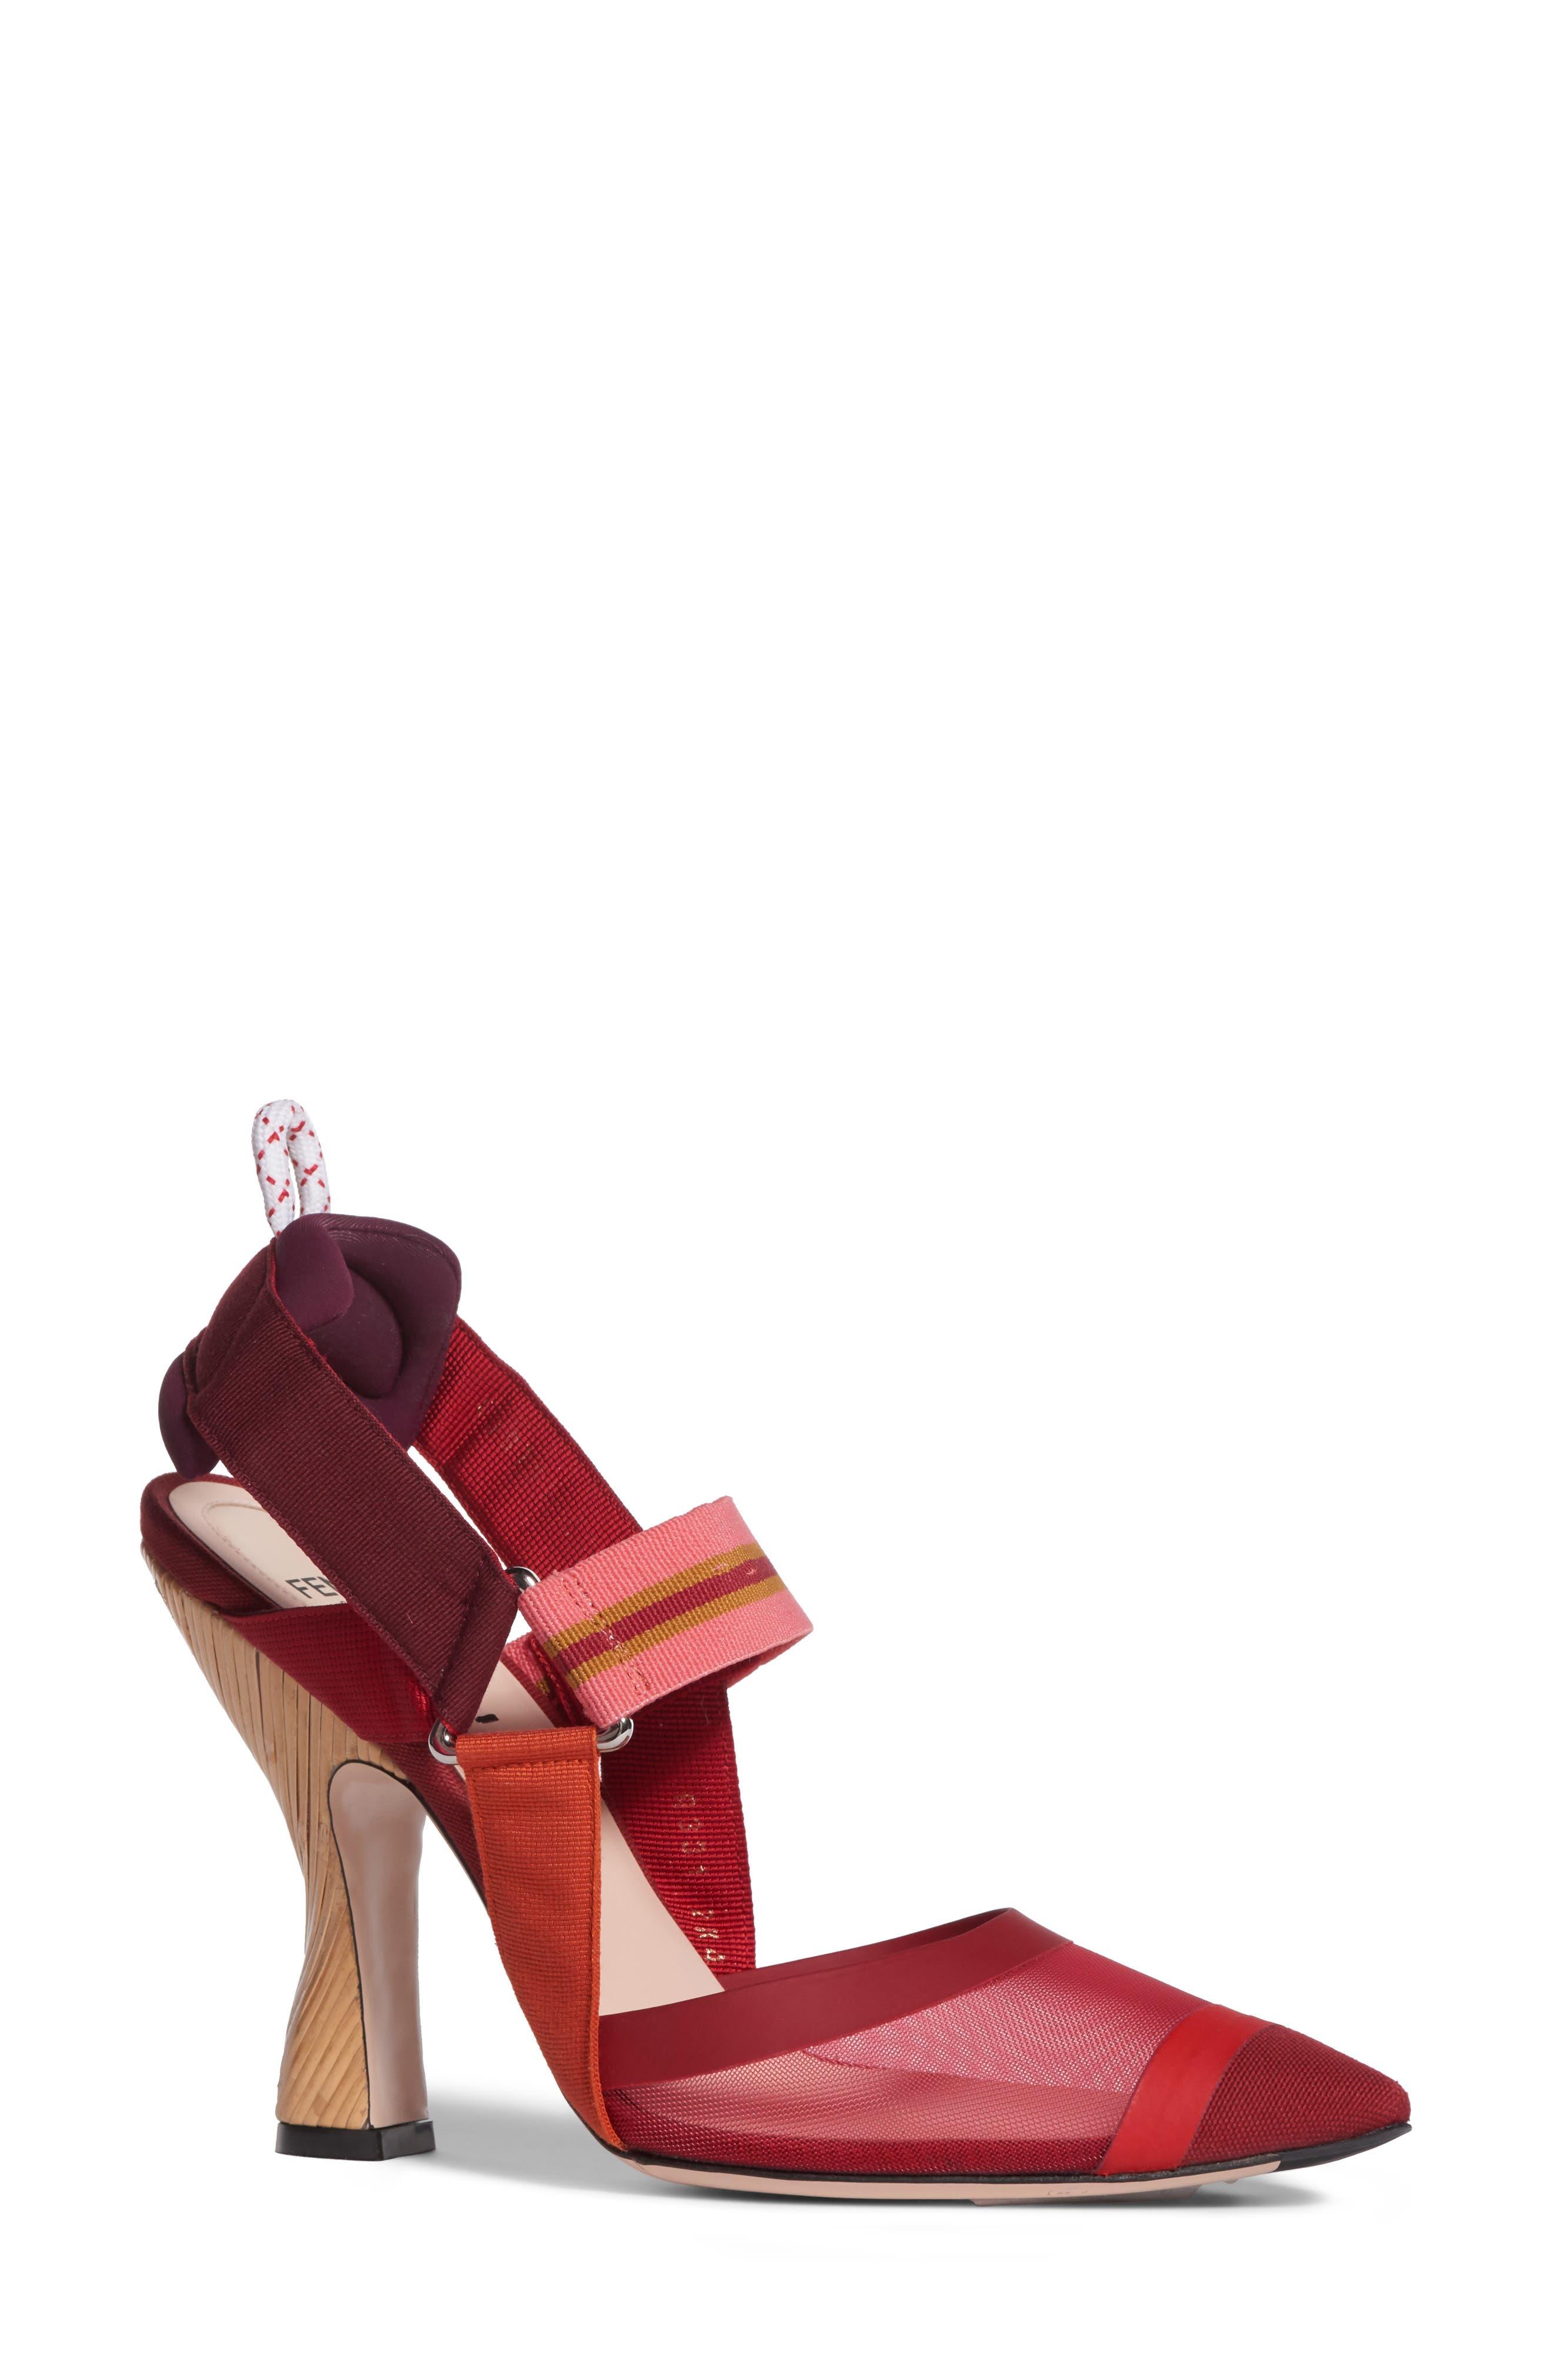 Fendi Women's Pointy Toe Pump nKkYiOP4Q2